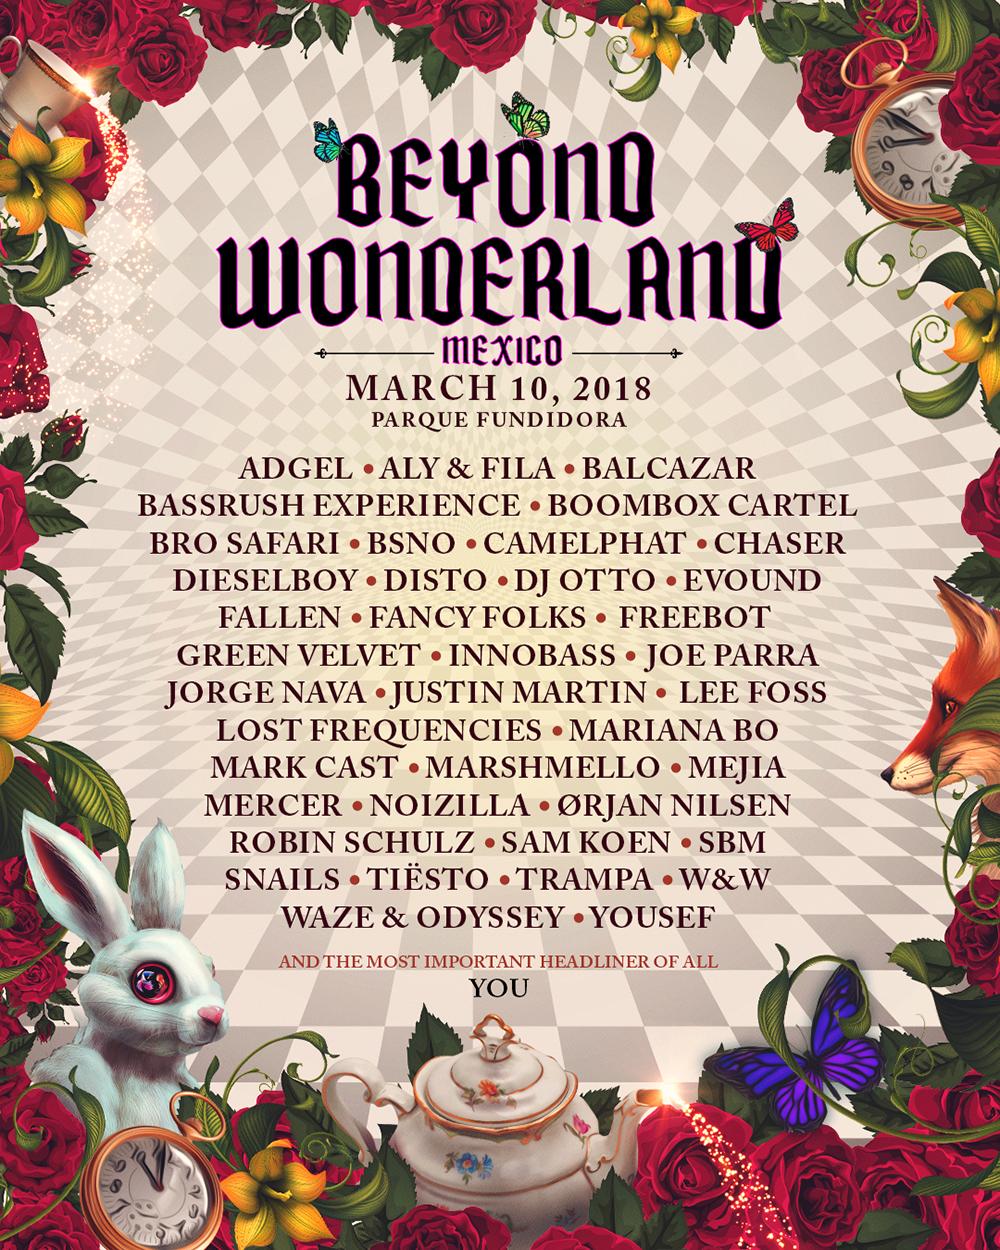 beyond_wonderland_mexico_lineup_1000x1250.jpg